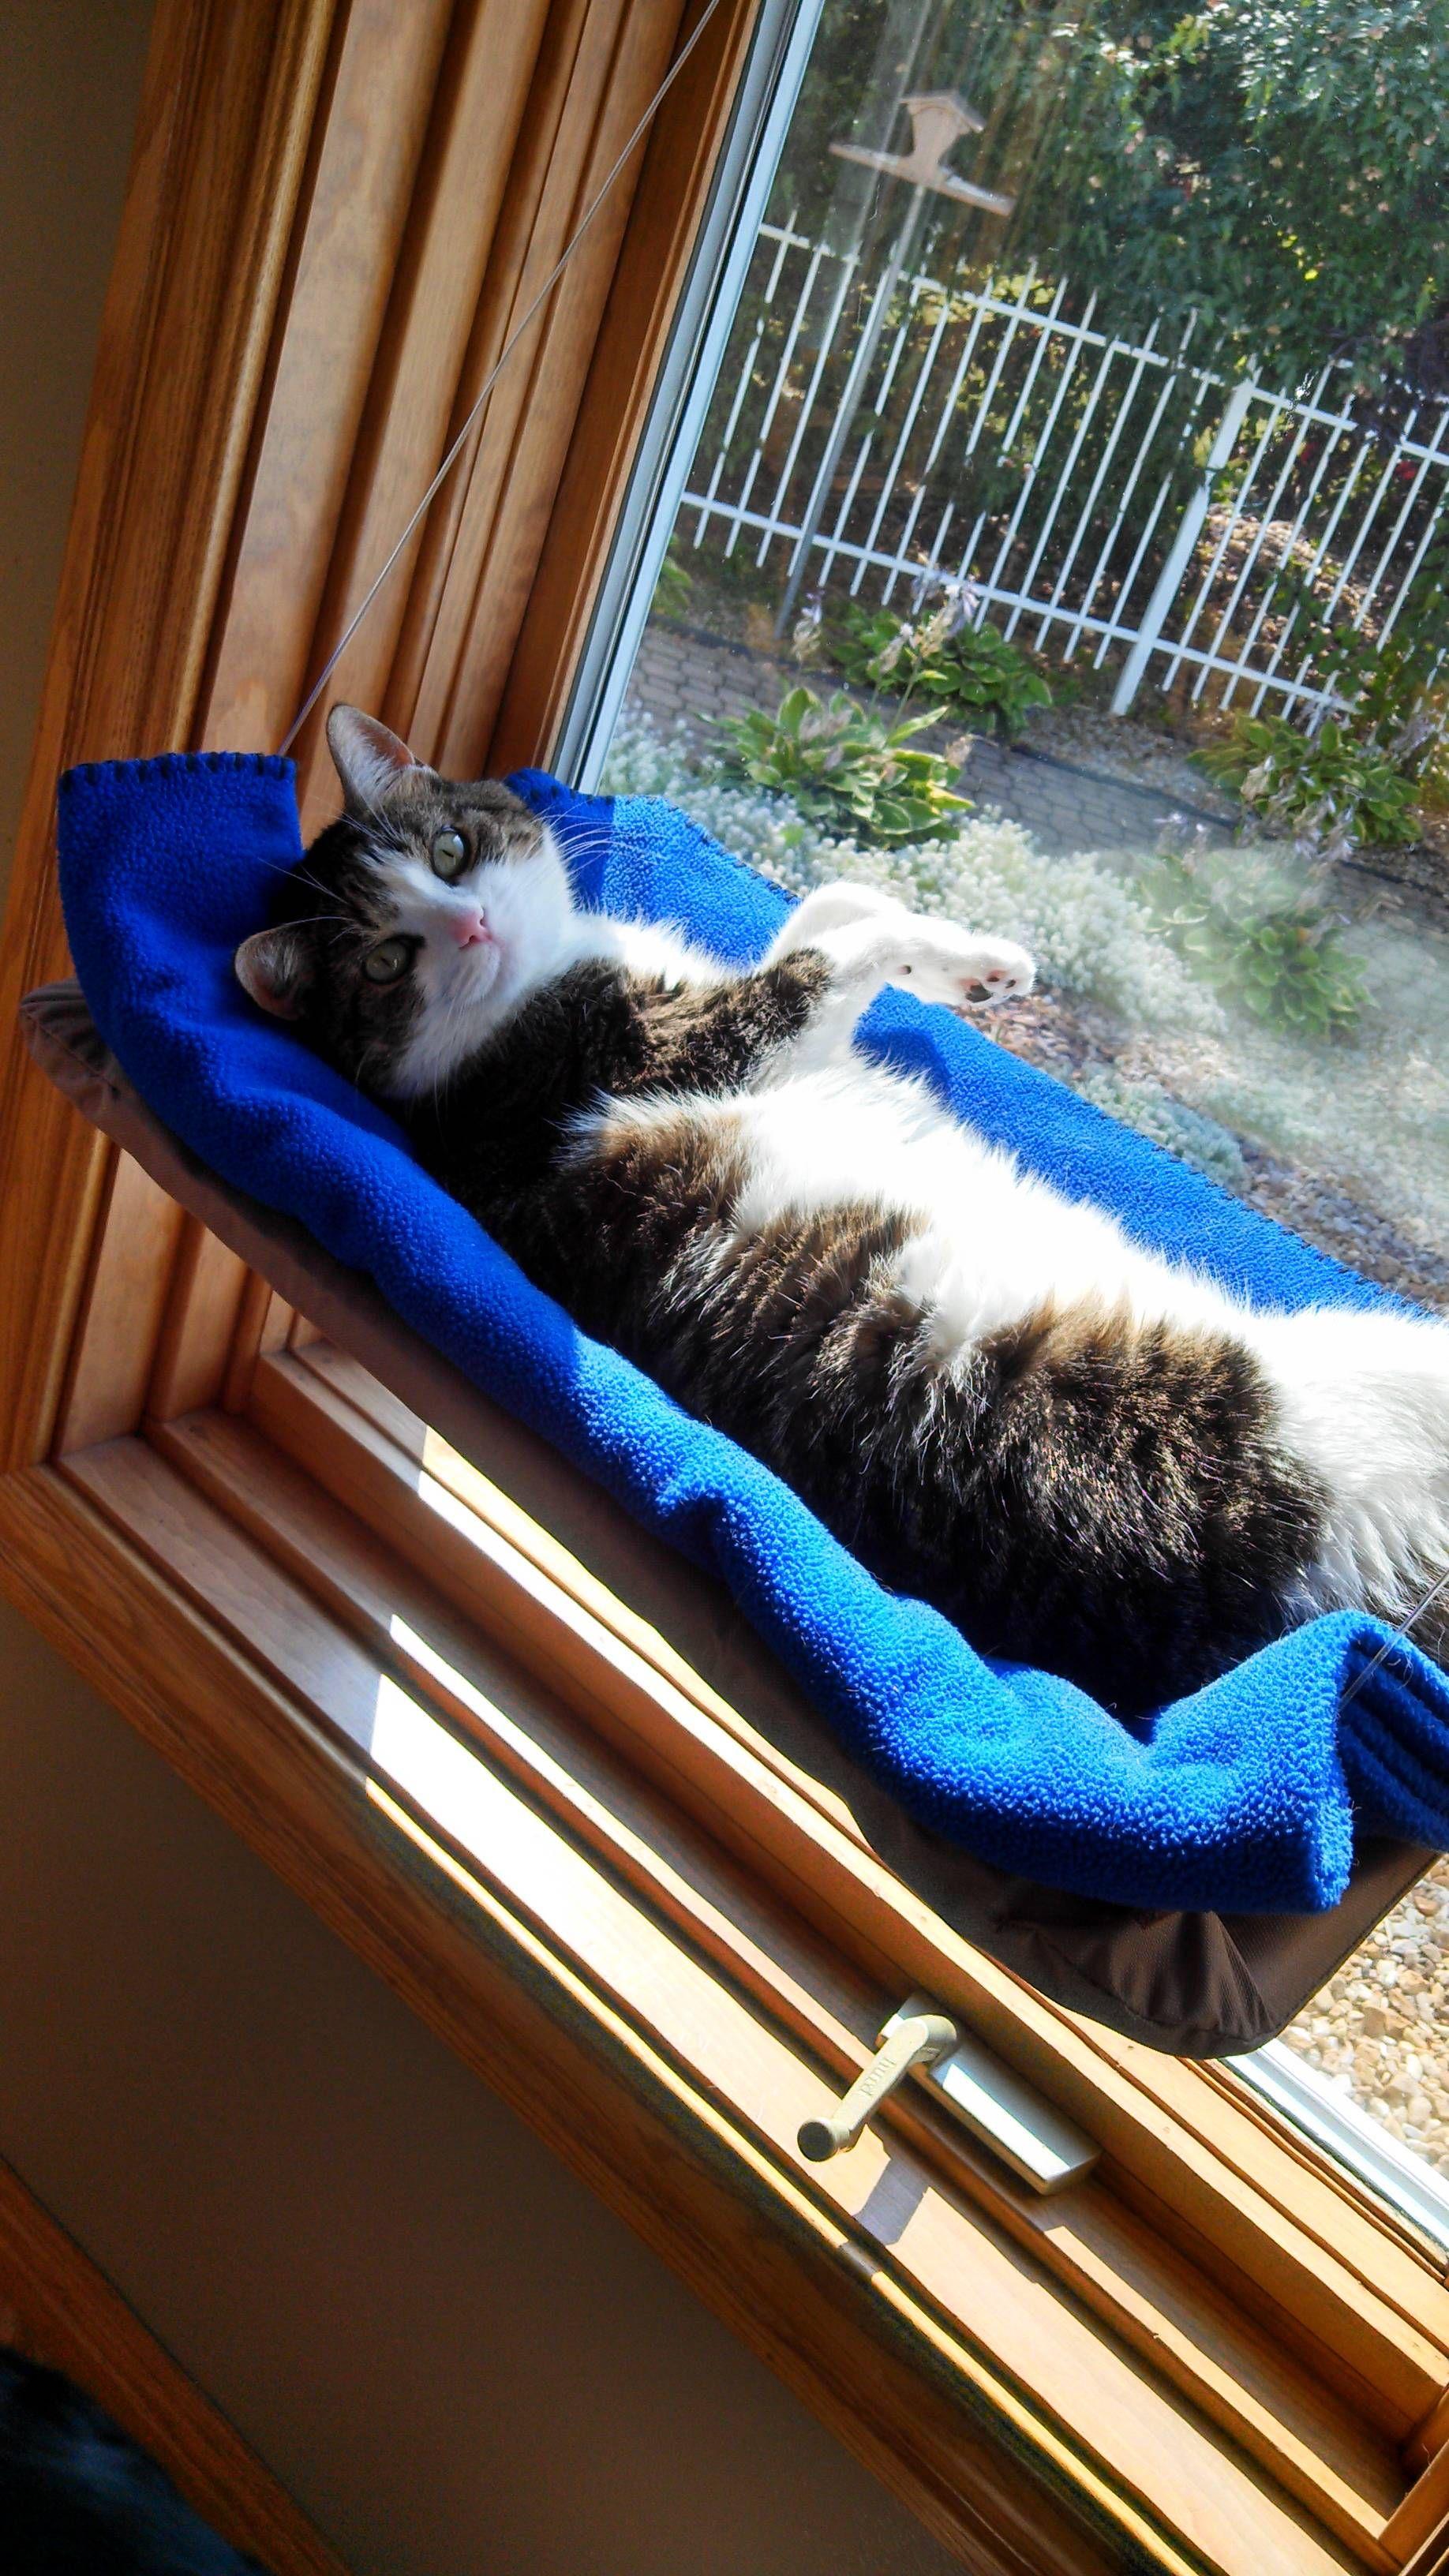 cat hammock  enough said  diy cat hammockdog hammock for carkitty     cat hammock  enough said    cat hammock cat and animal  rh   pinterest